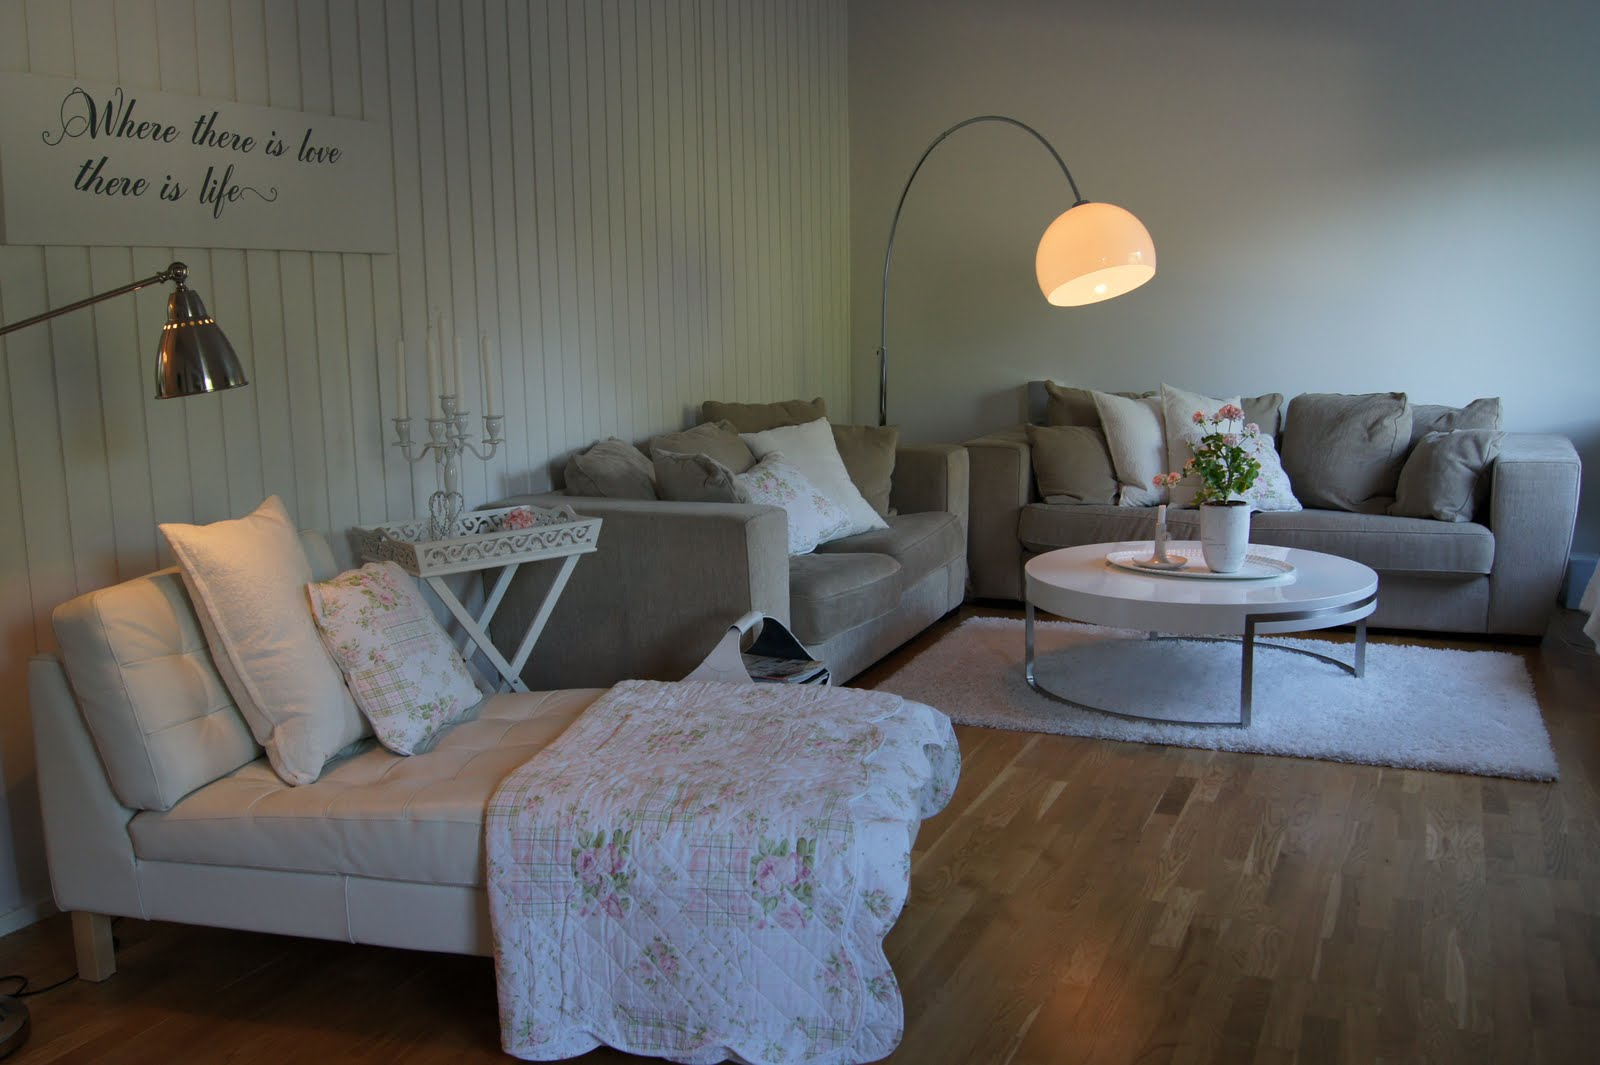 ideas de decoración rural para sala de estar 5 IDEAS PARA DECORAR SALAS DE ESTAR MODERNAS Hoy LowCost